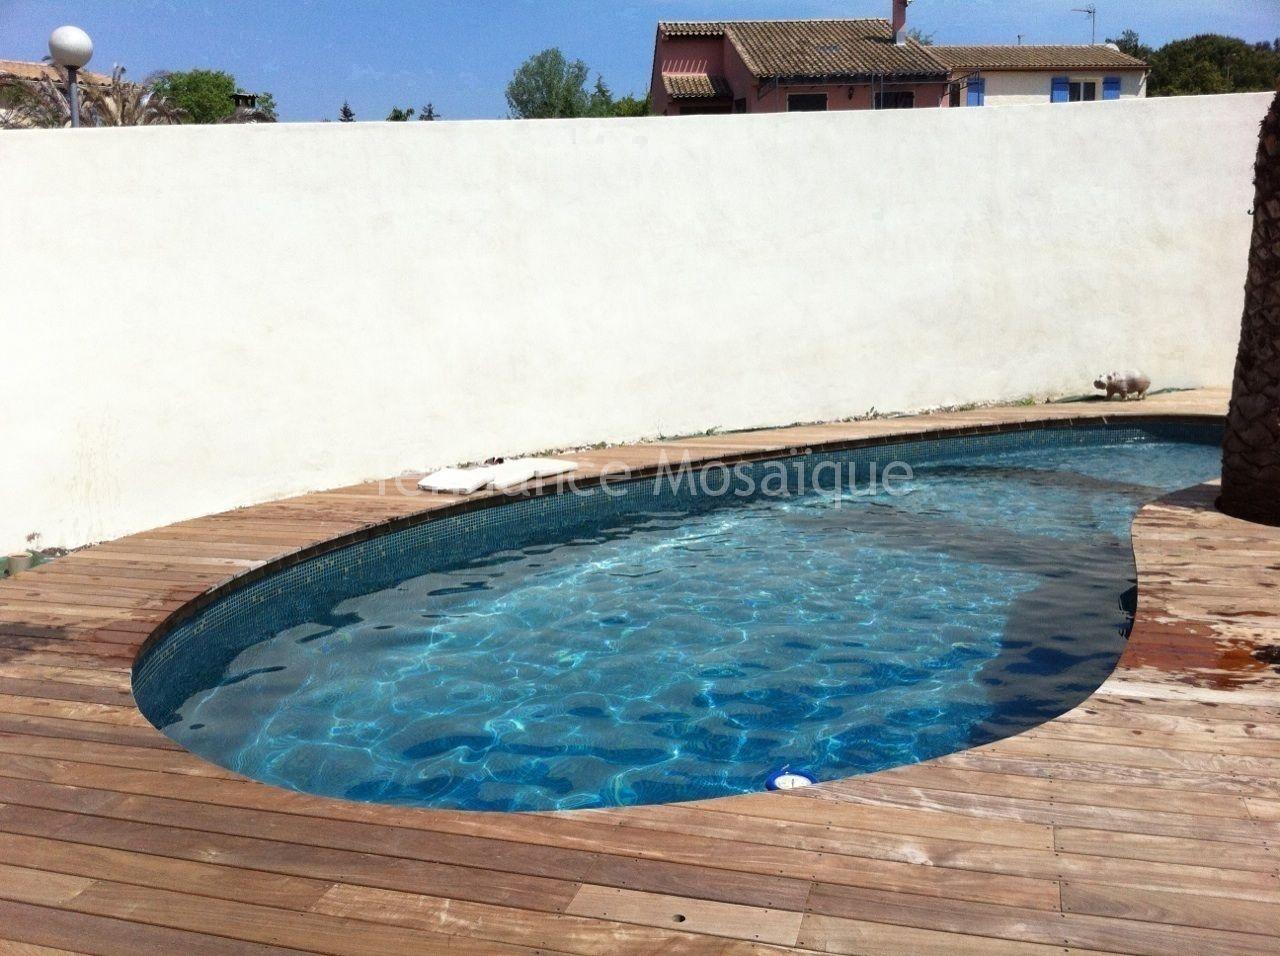 piscine p te de verre dolce mosaic r f rence delia bleu. Black Bedroom Furniture Sets. Home Design Ideas